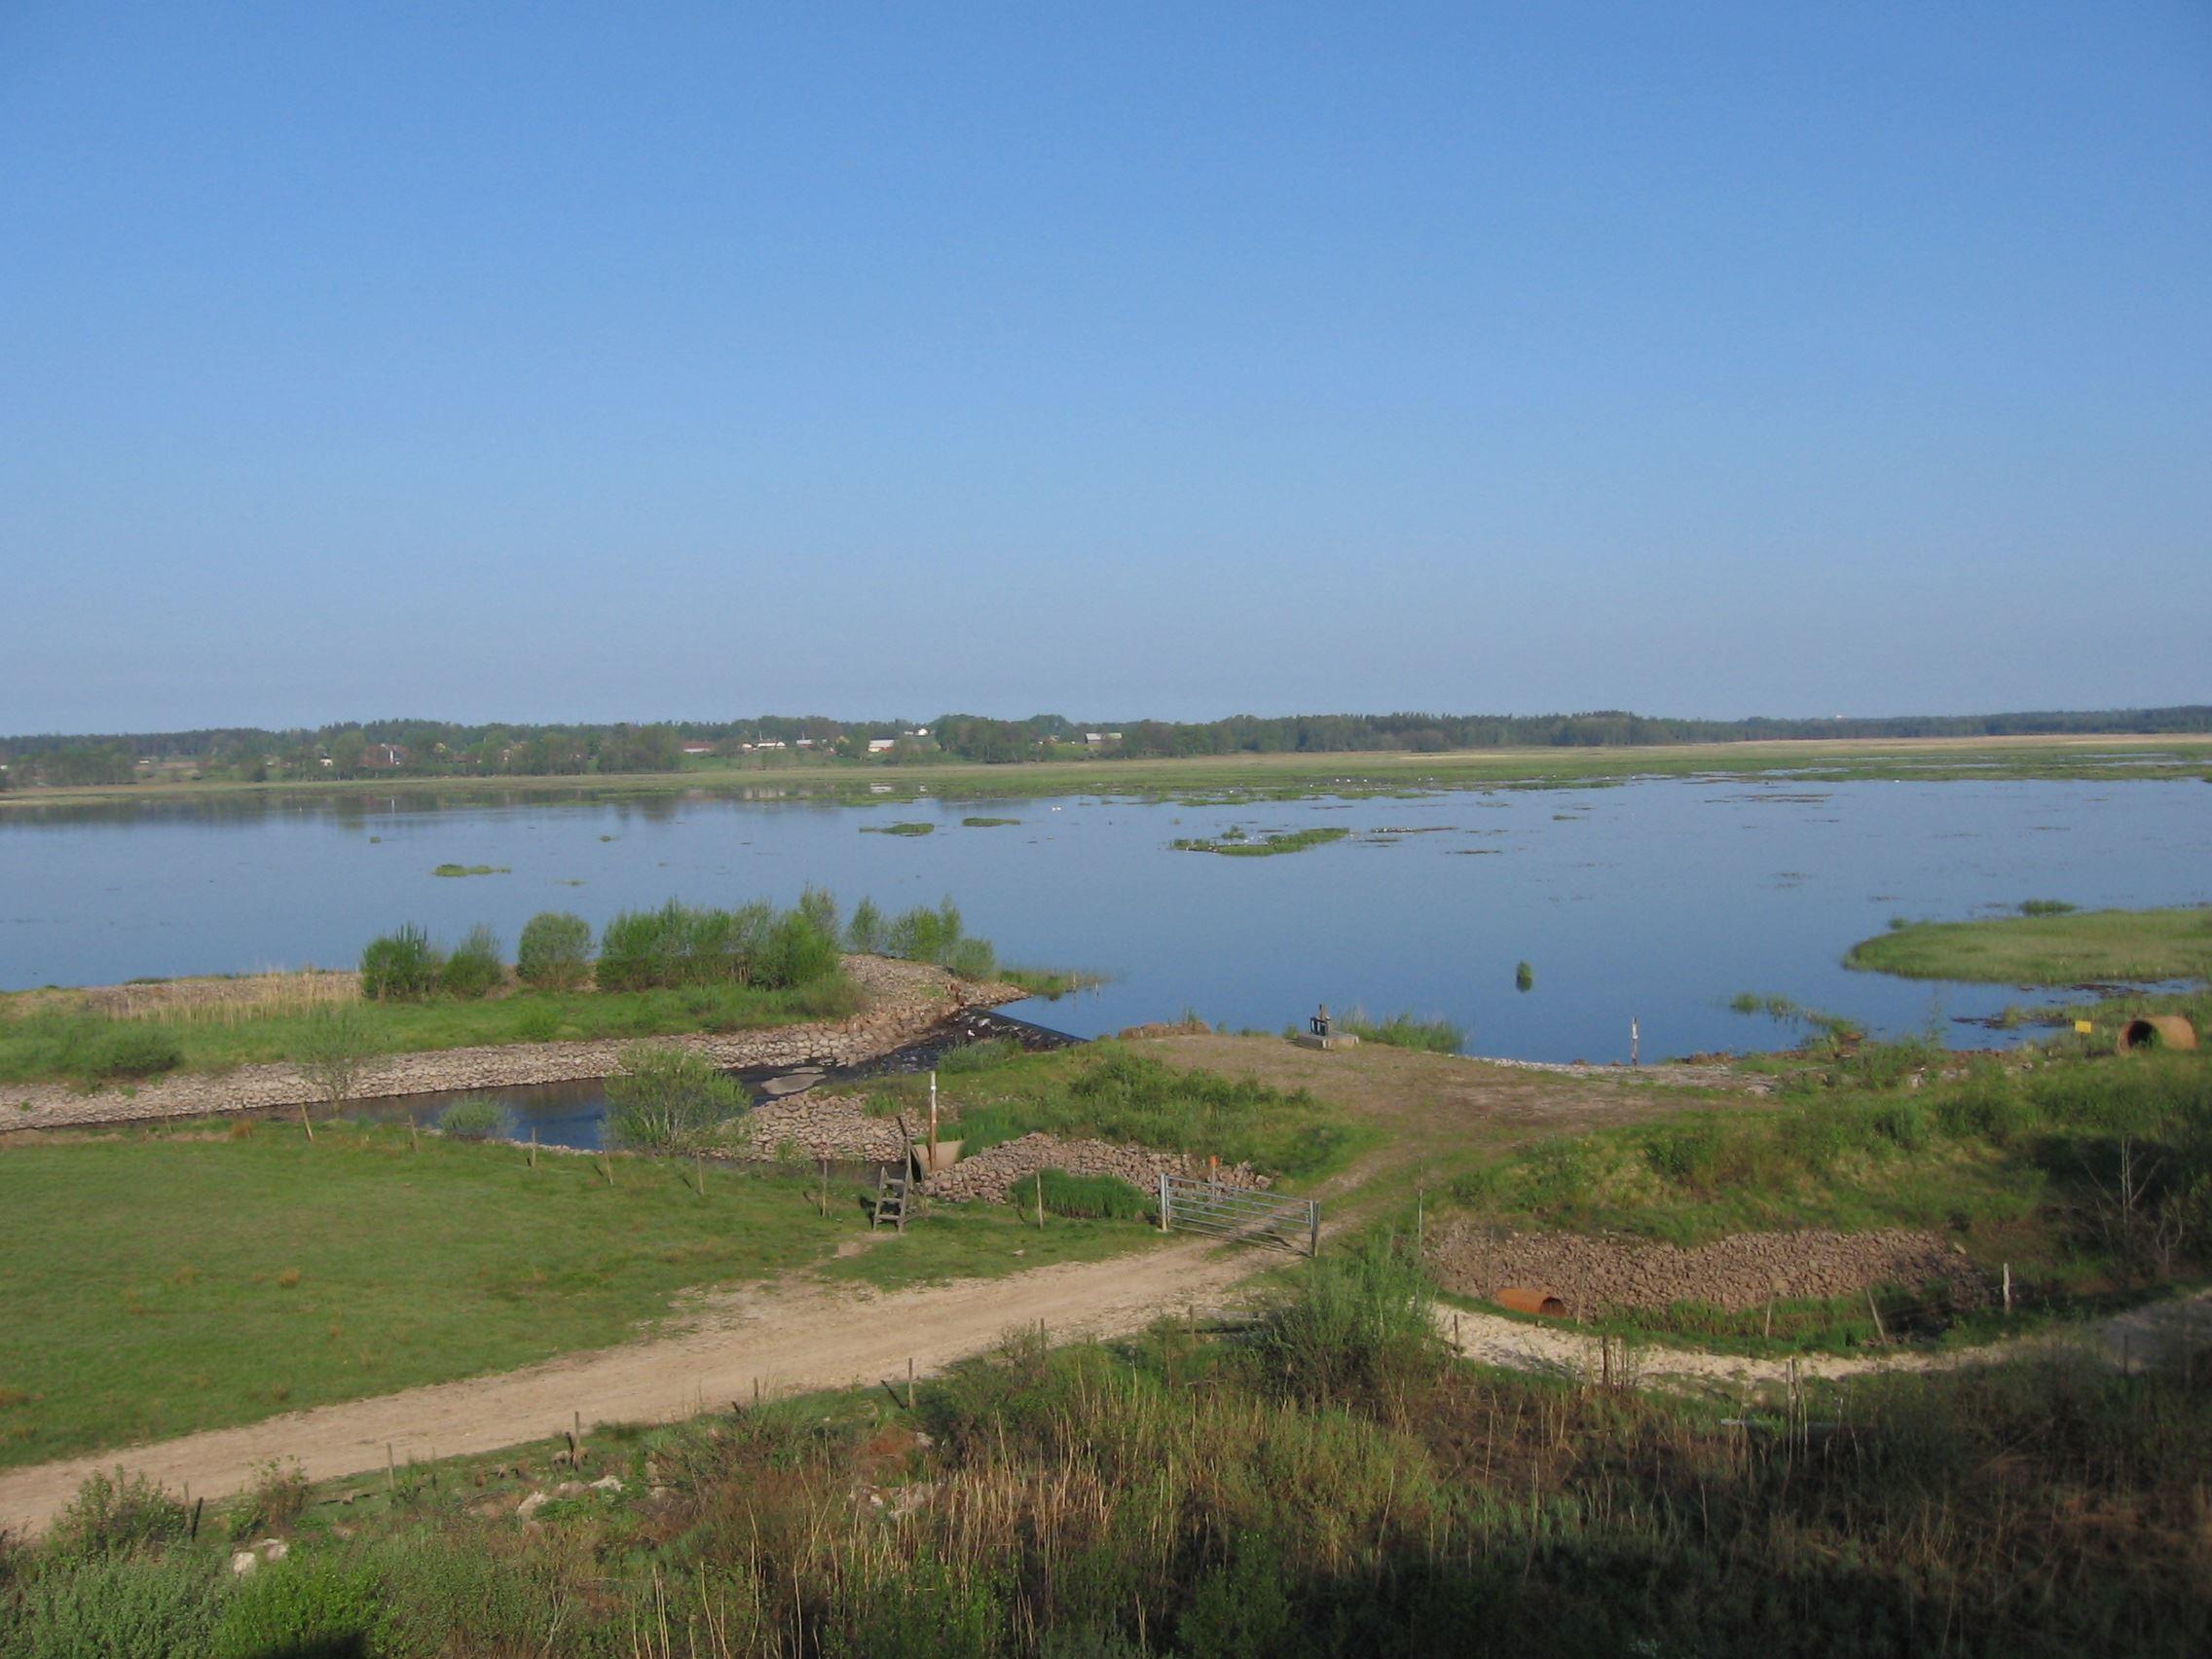 Draven Nature Reserve